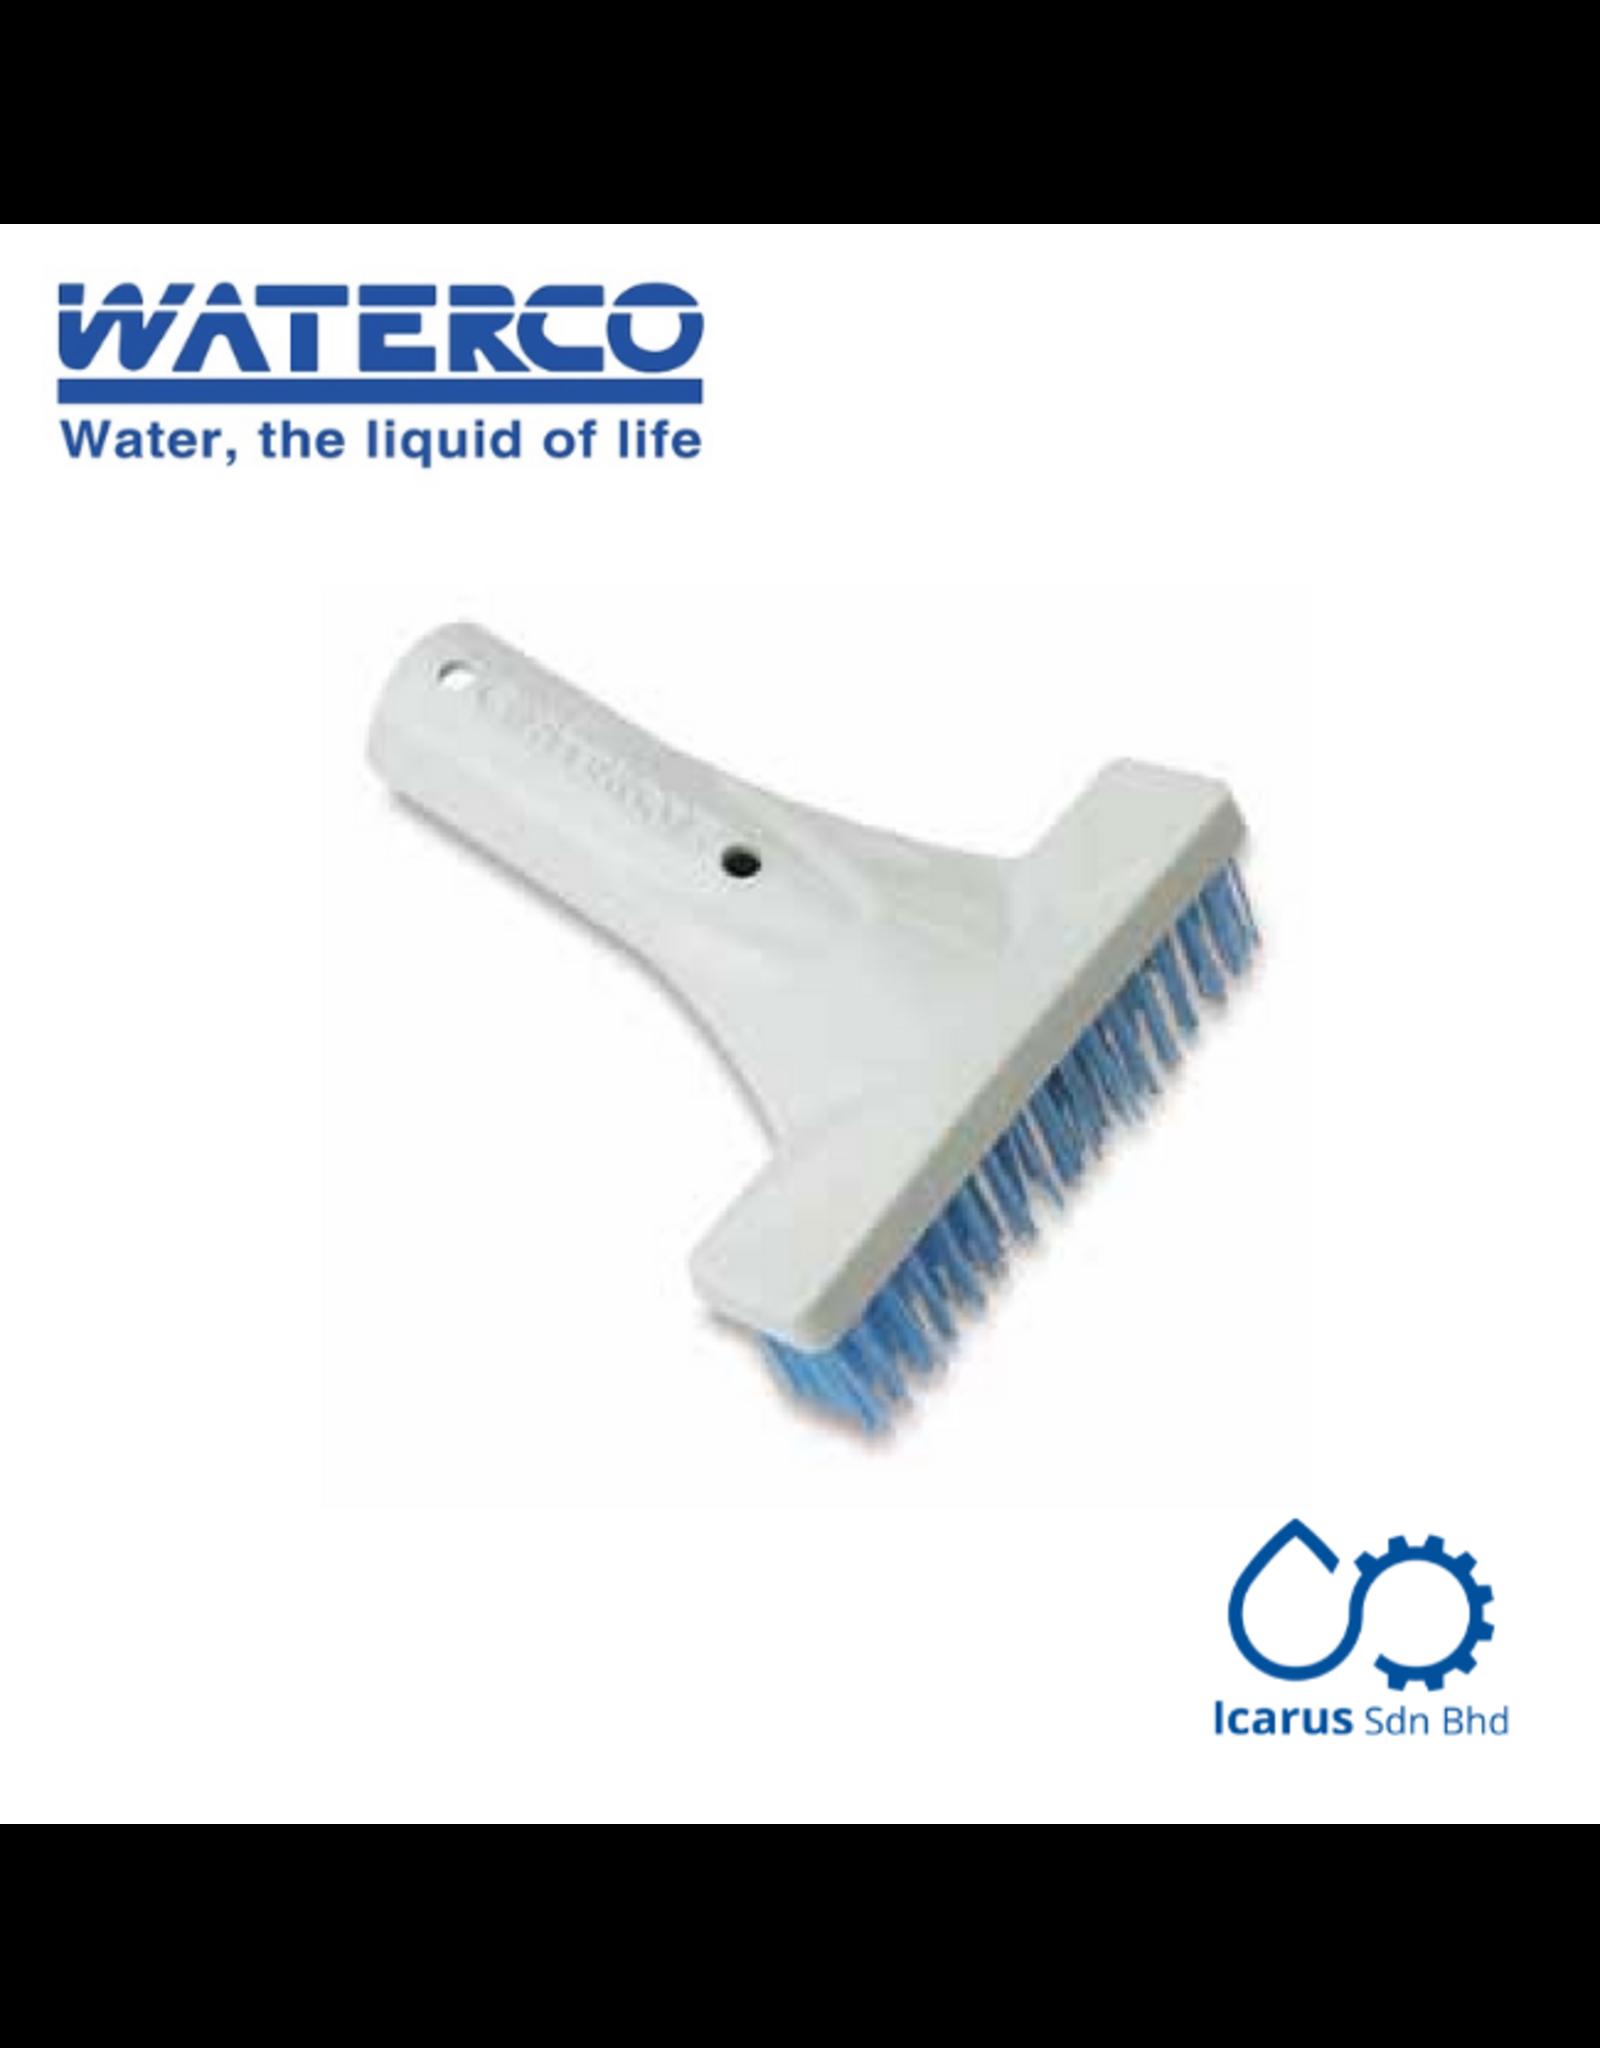 Waterco Algae Brush PRO, 12 inch, Blue Bristle